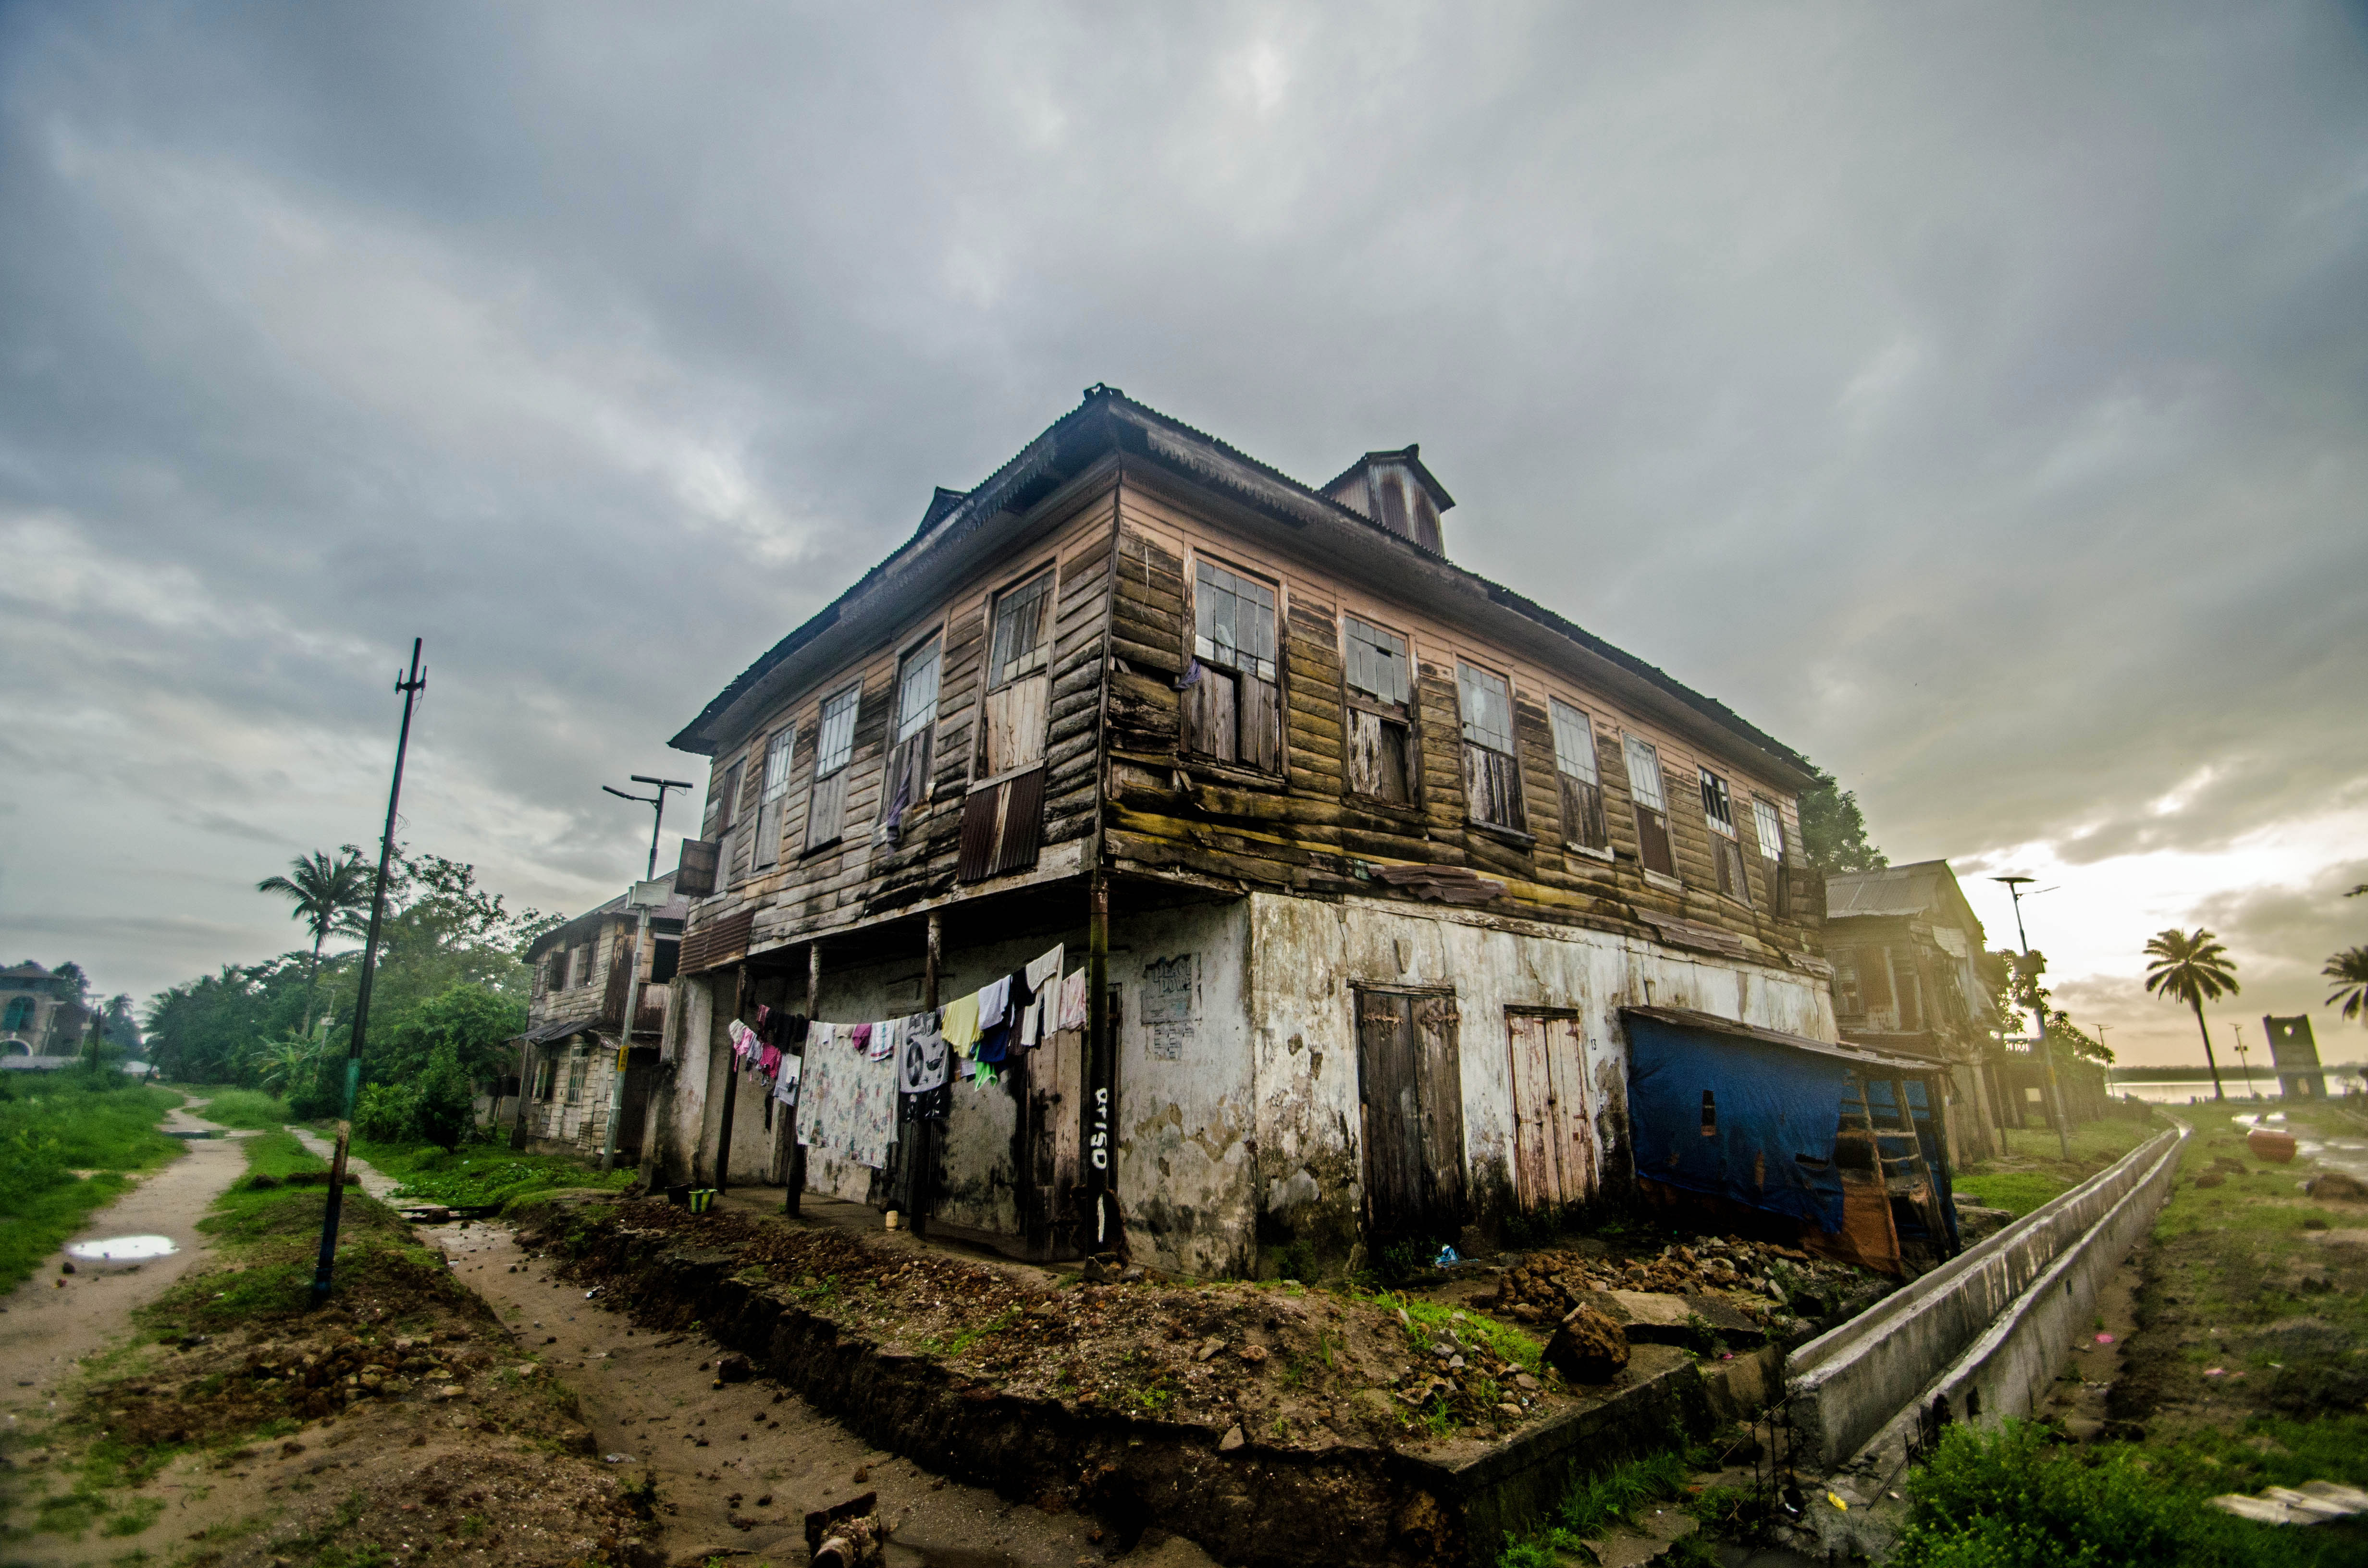 Sierra Leone's layers of history Al Jazeera